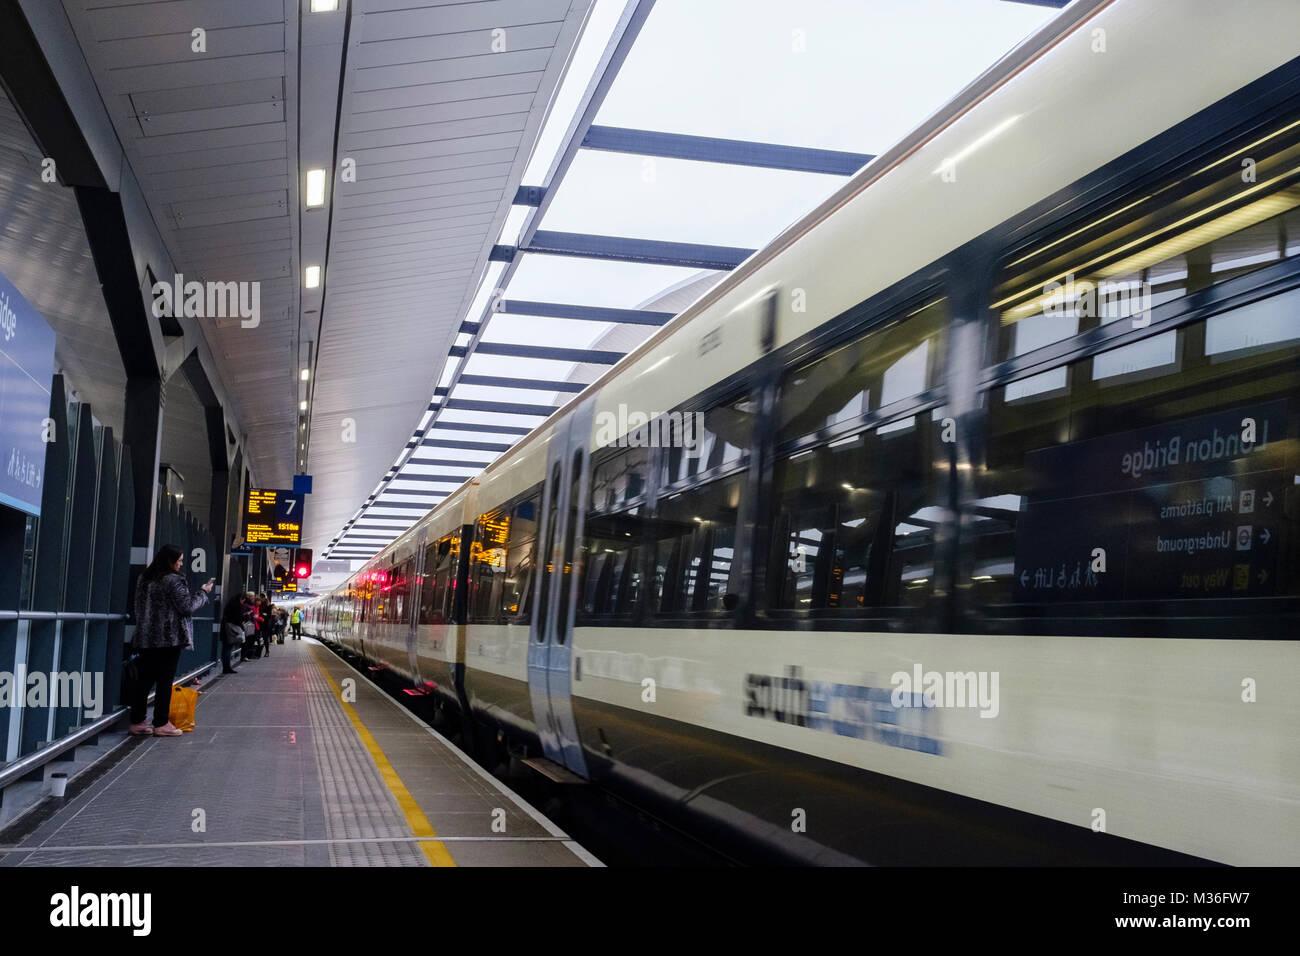 A Southeastern train passing through London Bridge station, London, UK - Stock Image